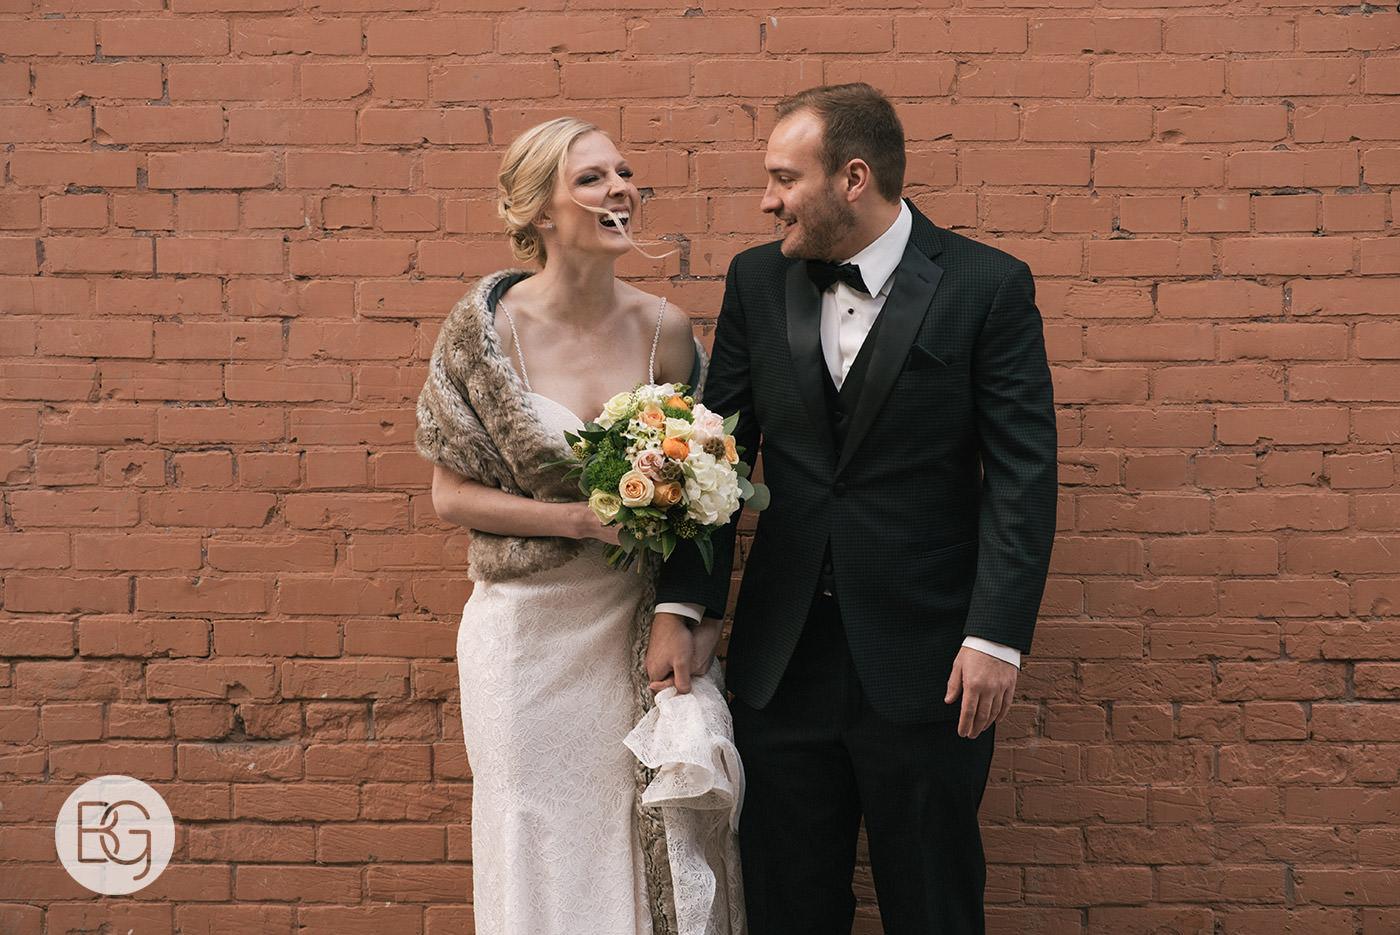 Edmonton_wedding_photographers_josh_sara_whyte_15.jpg